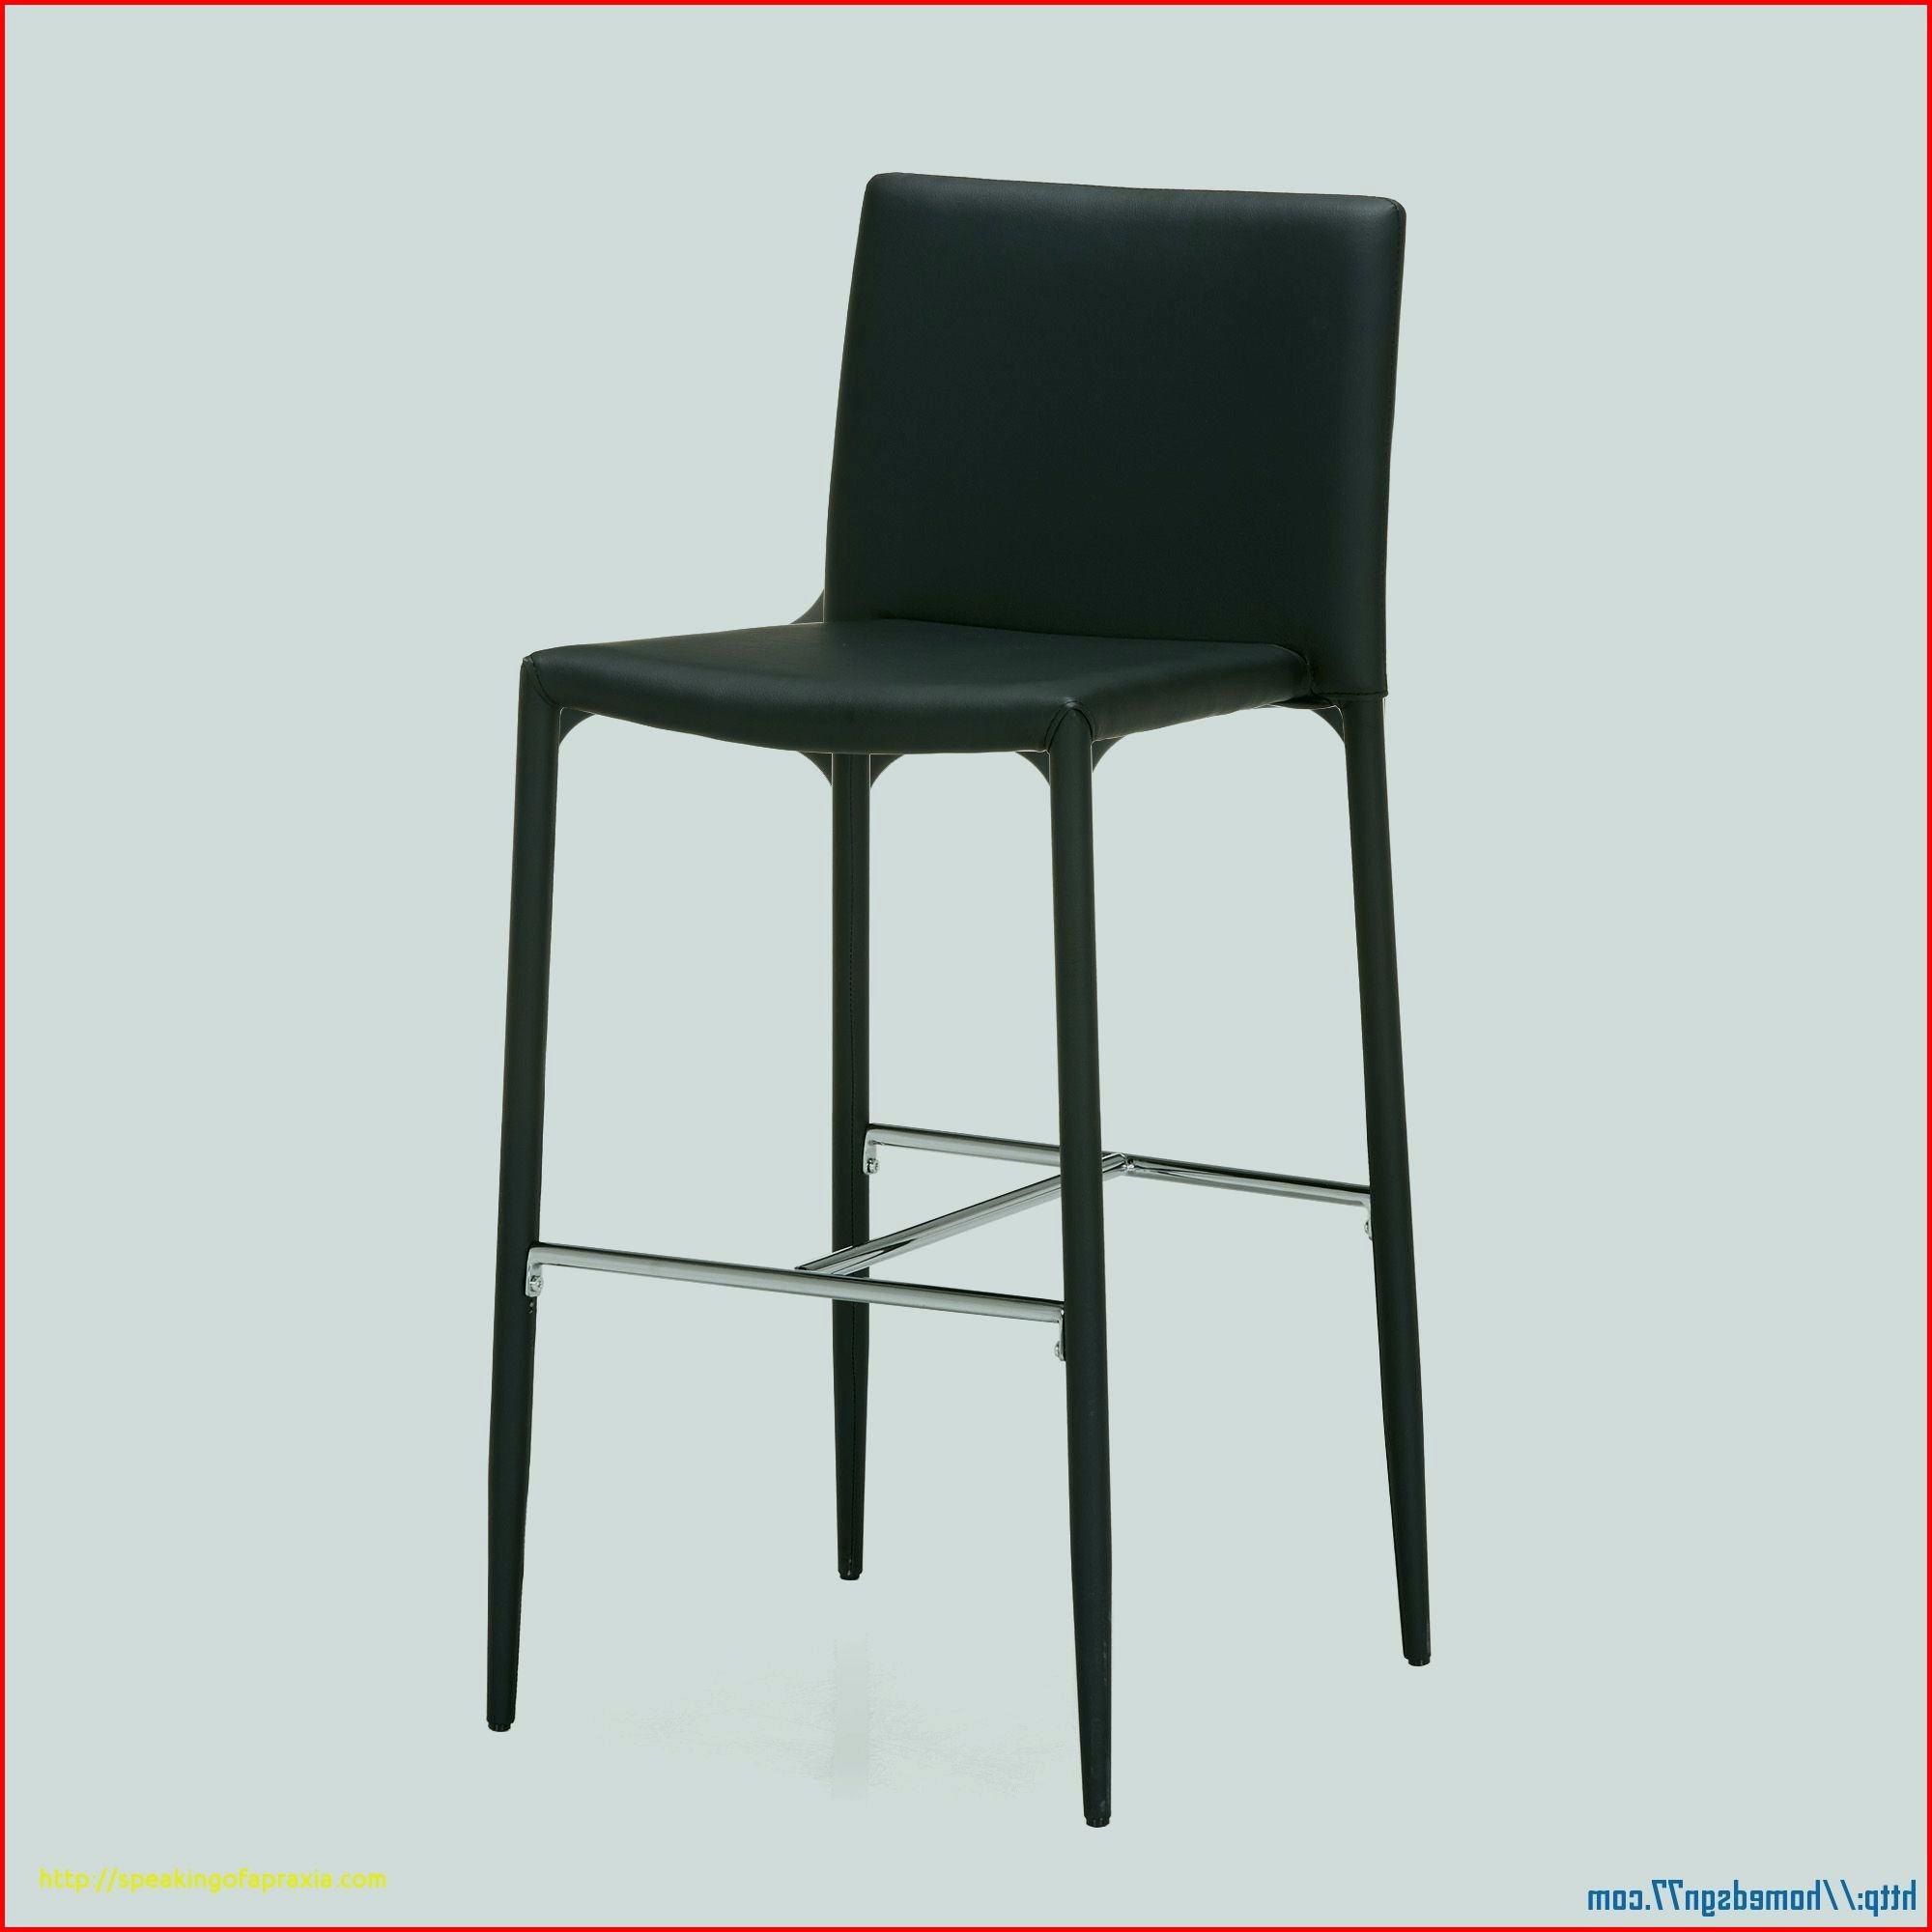 Relooker Une Chaise Haute En Bois evolutive bois bois chaise chaise chaise haute alinea haute